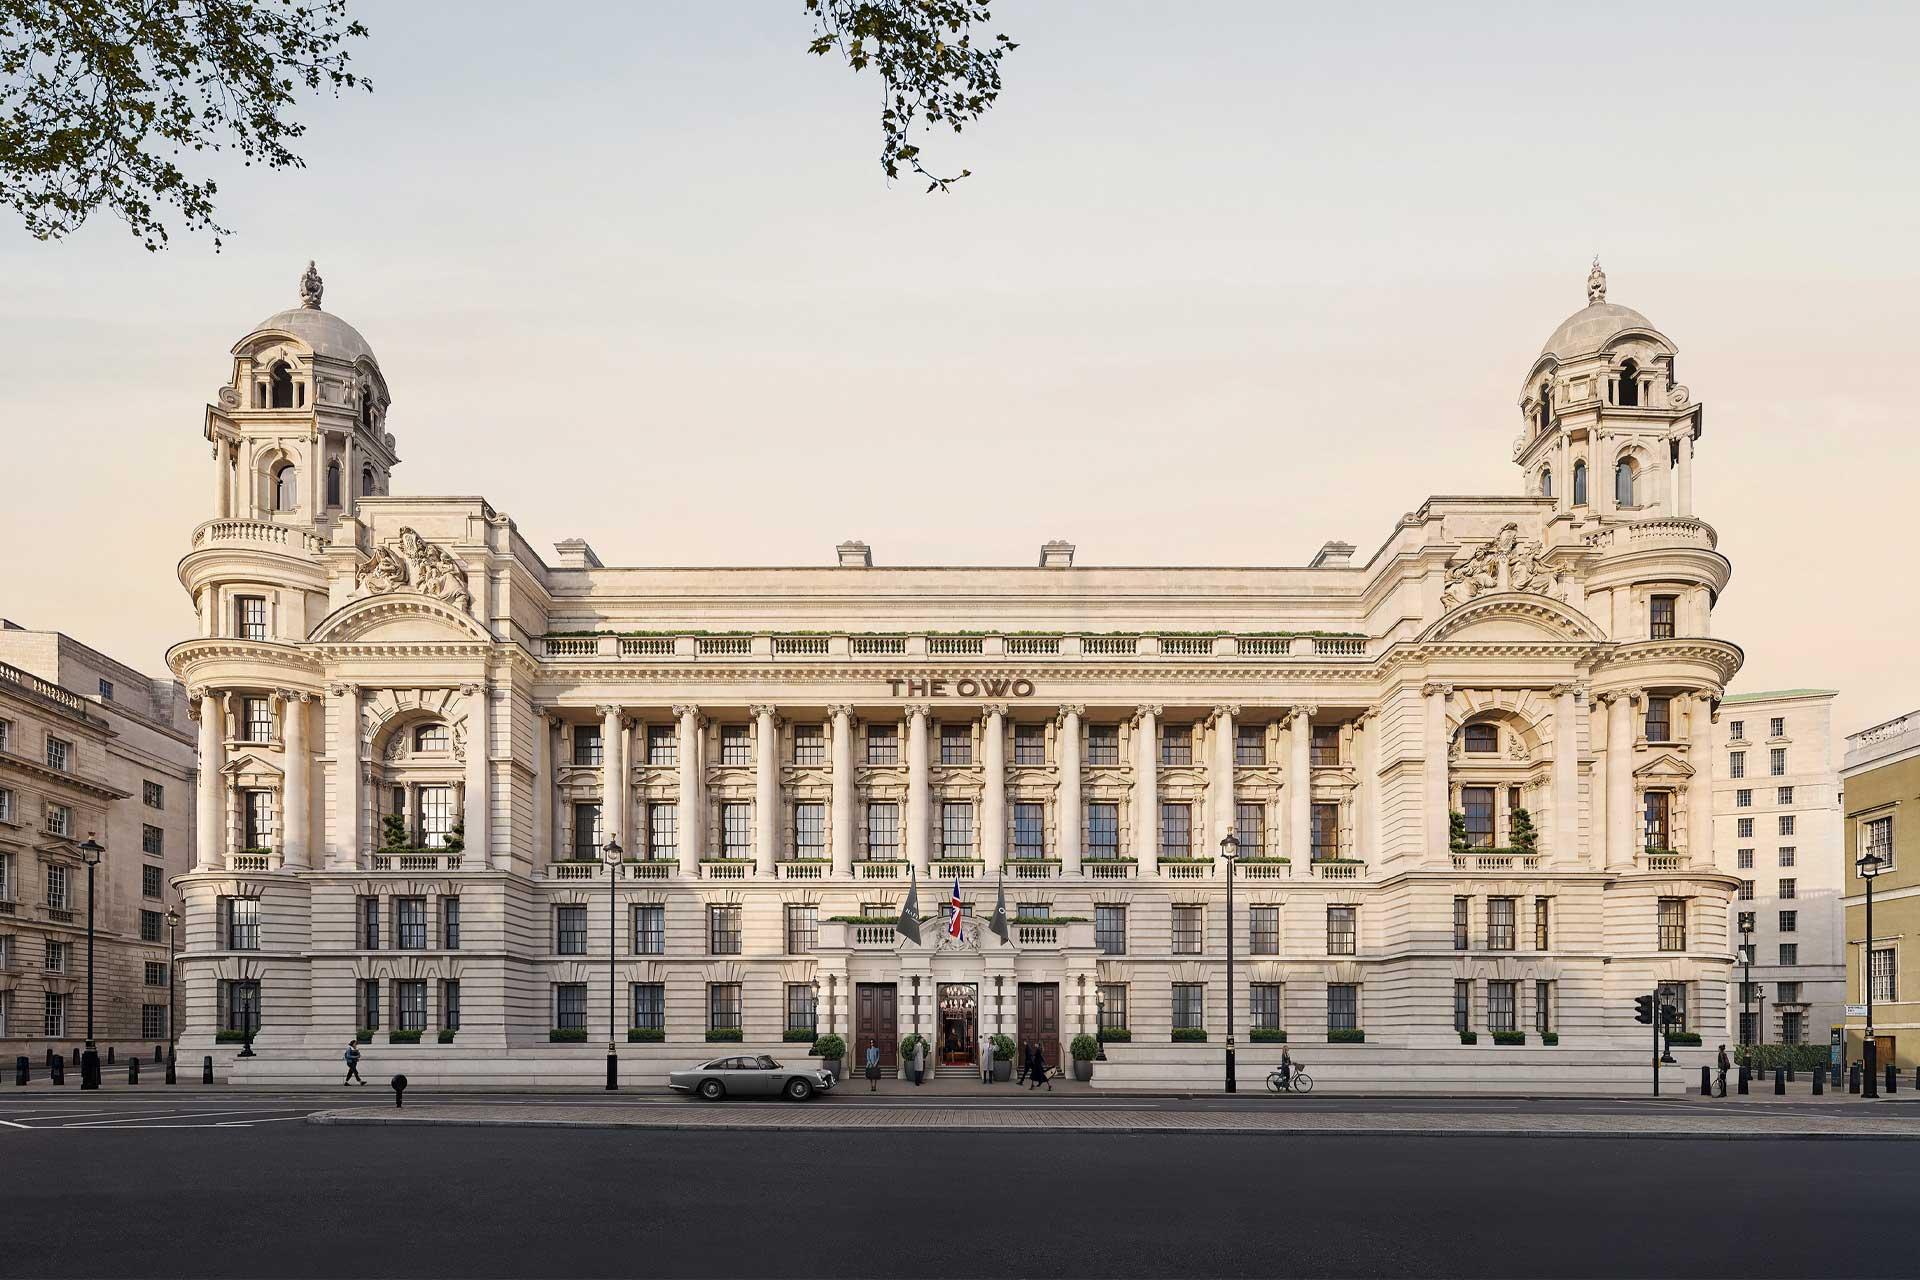 The Raffles Hotel in London